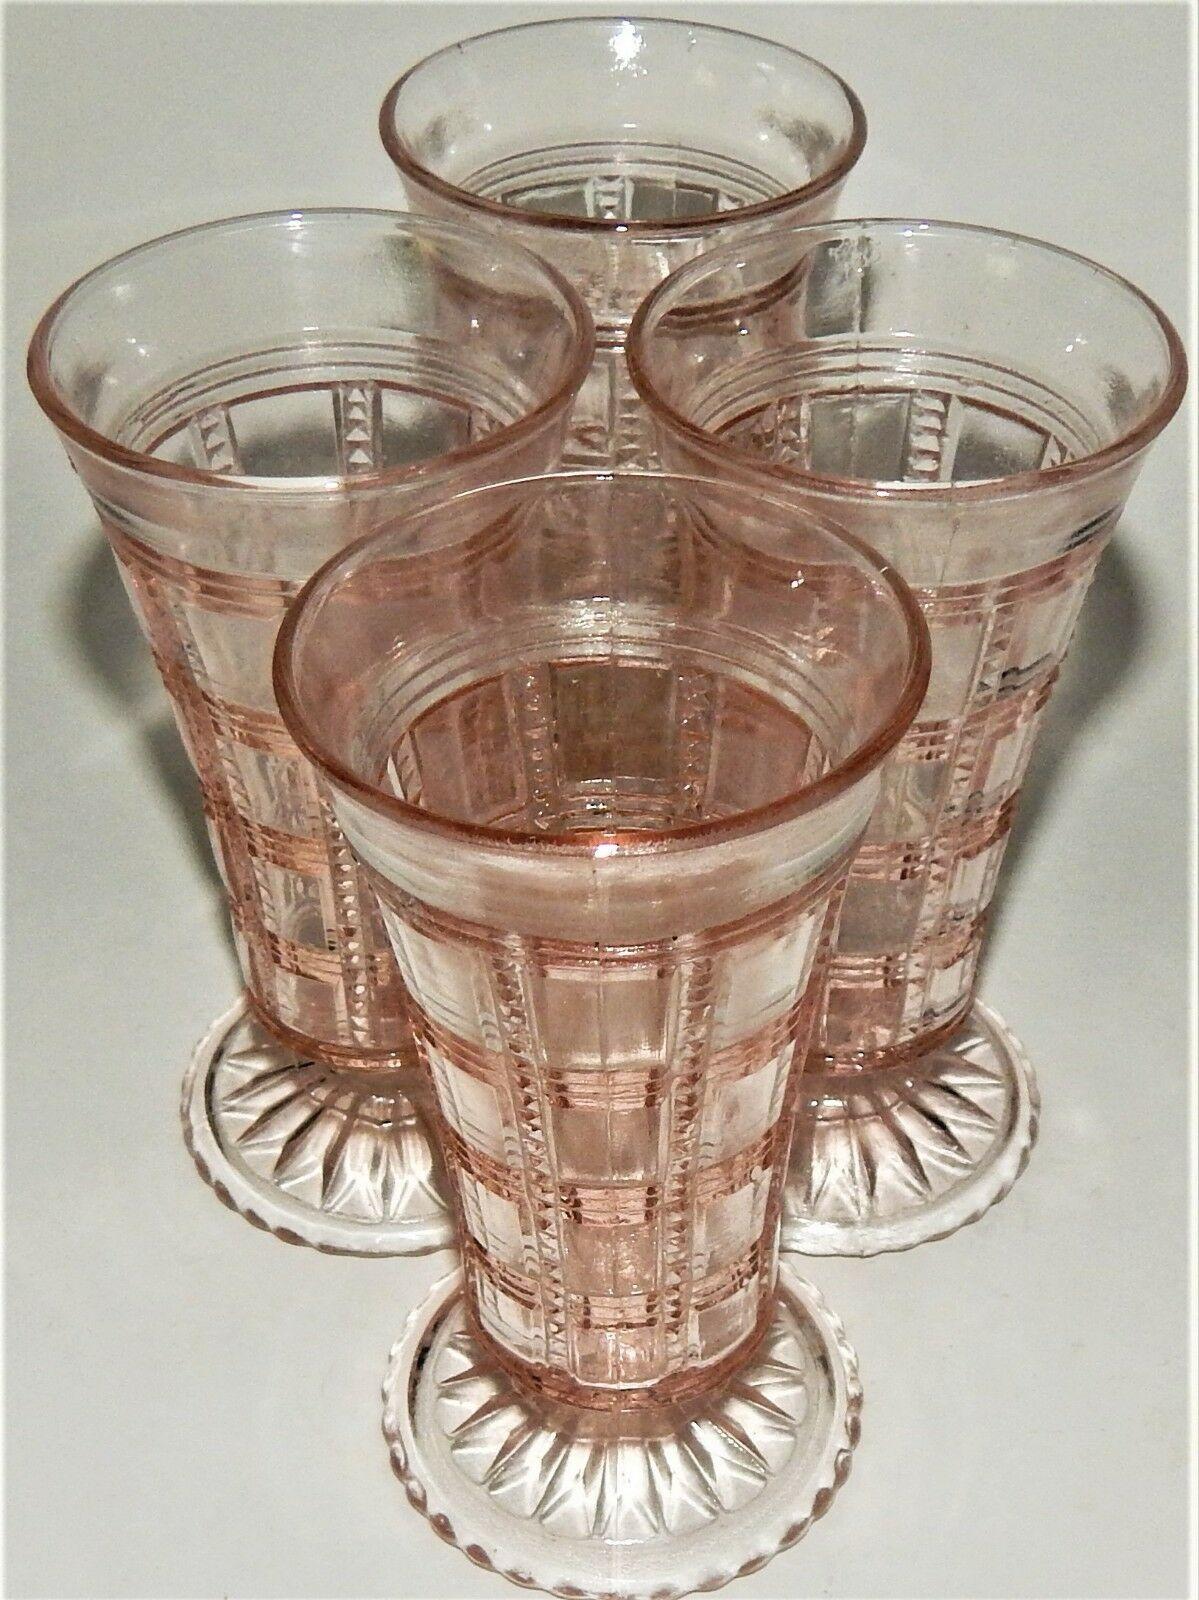 4 Imperial Pink Depression Glass Beaded Block Bud Vase Footed Jellies Vintage